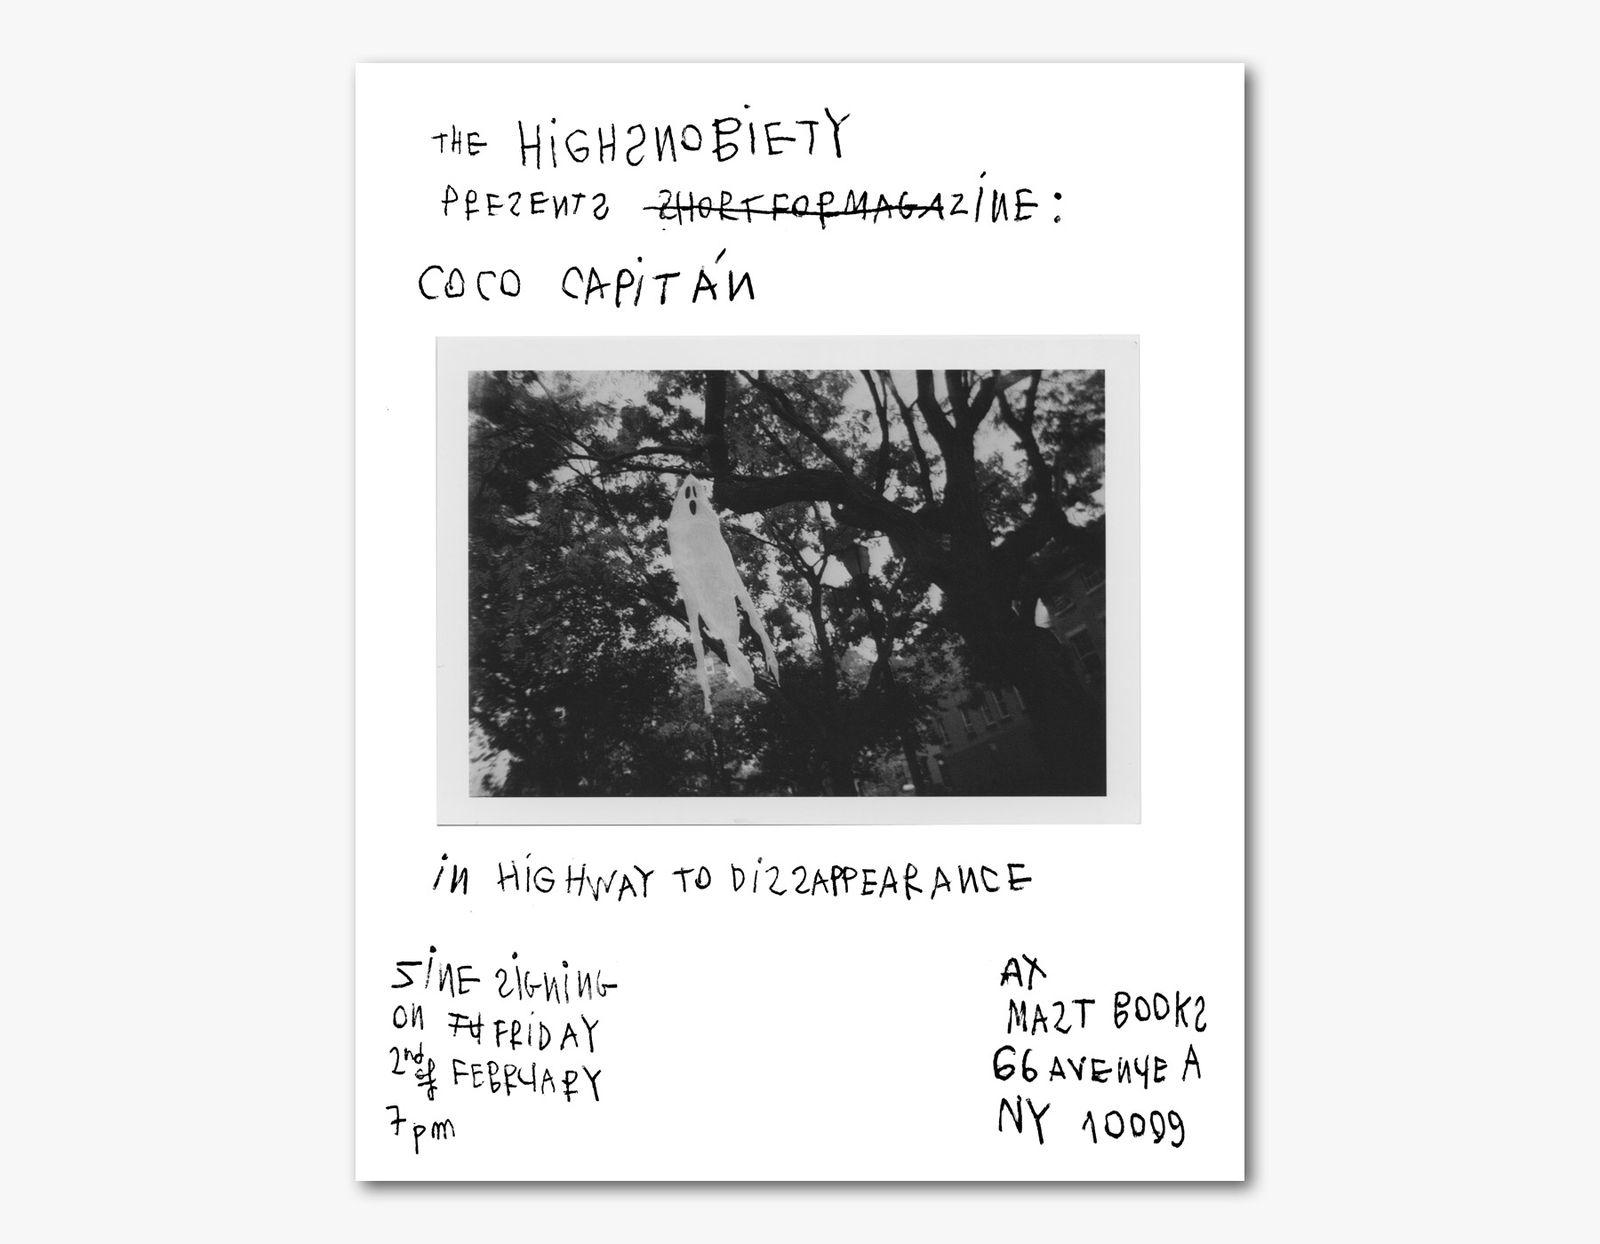 Coco-Capitan-Highsnobiety-Short-For-Magazine-02